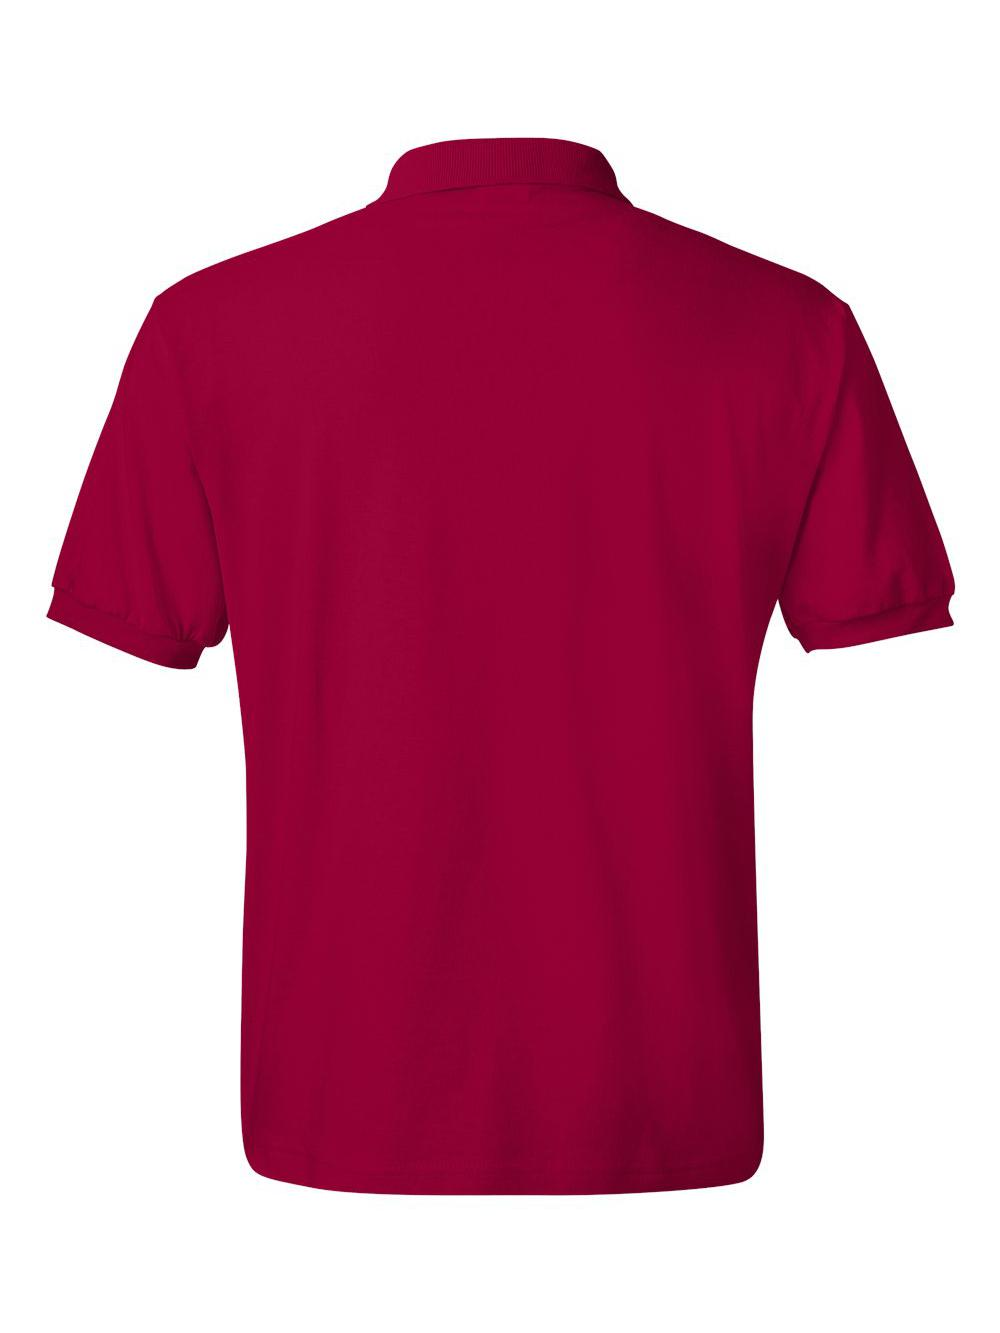 Hanes-Ecosmart-Jersey-Sport-Shirt-054X thumbnail 16